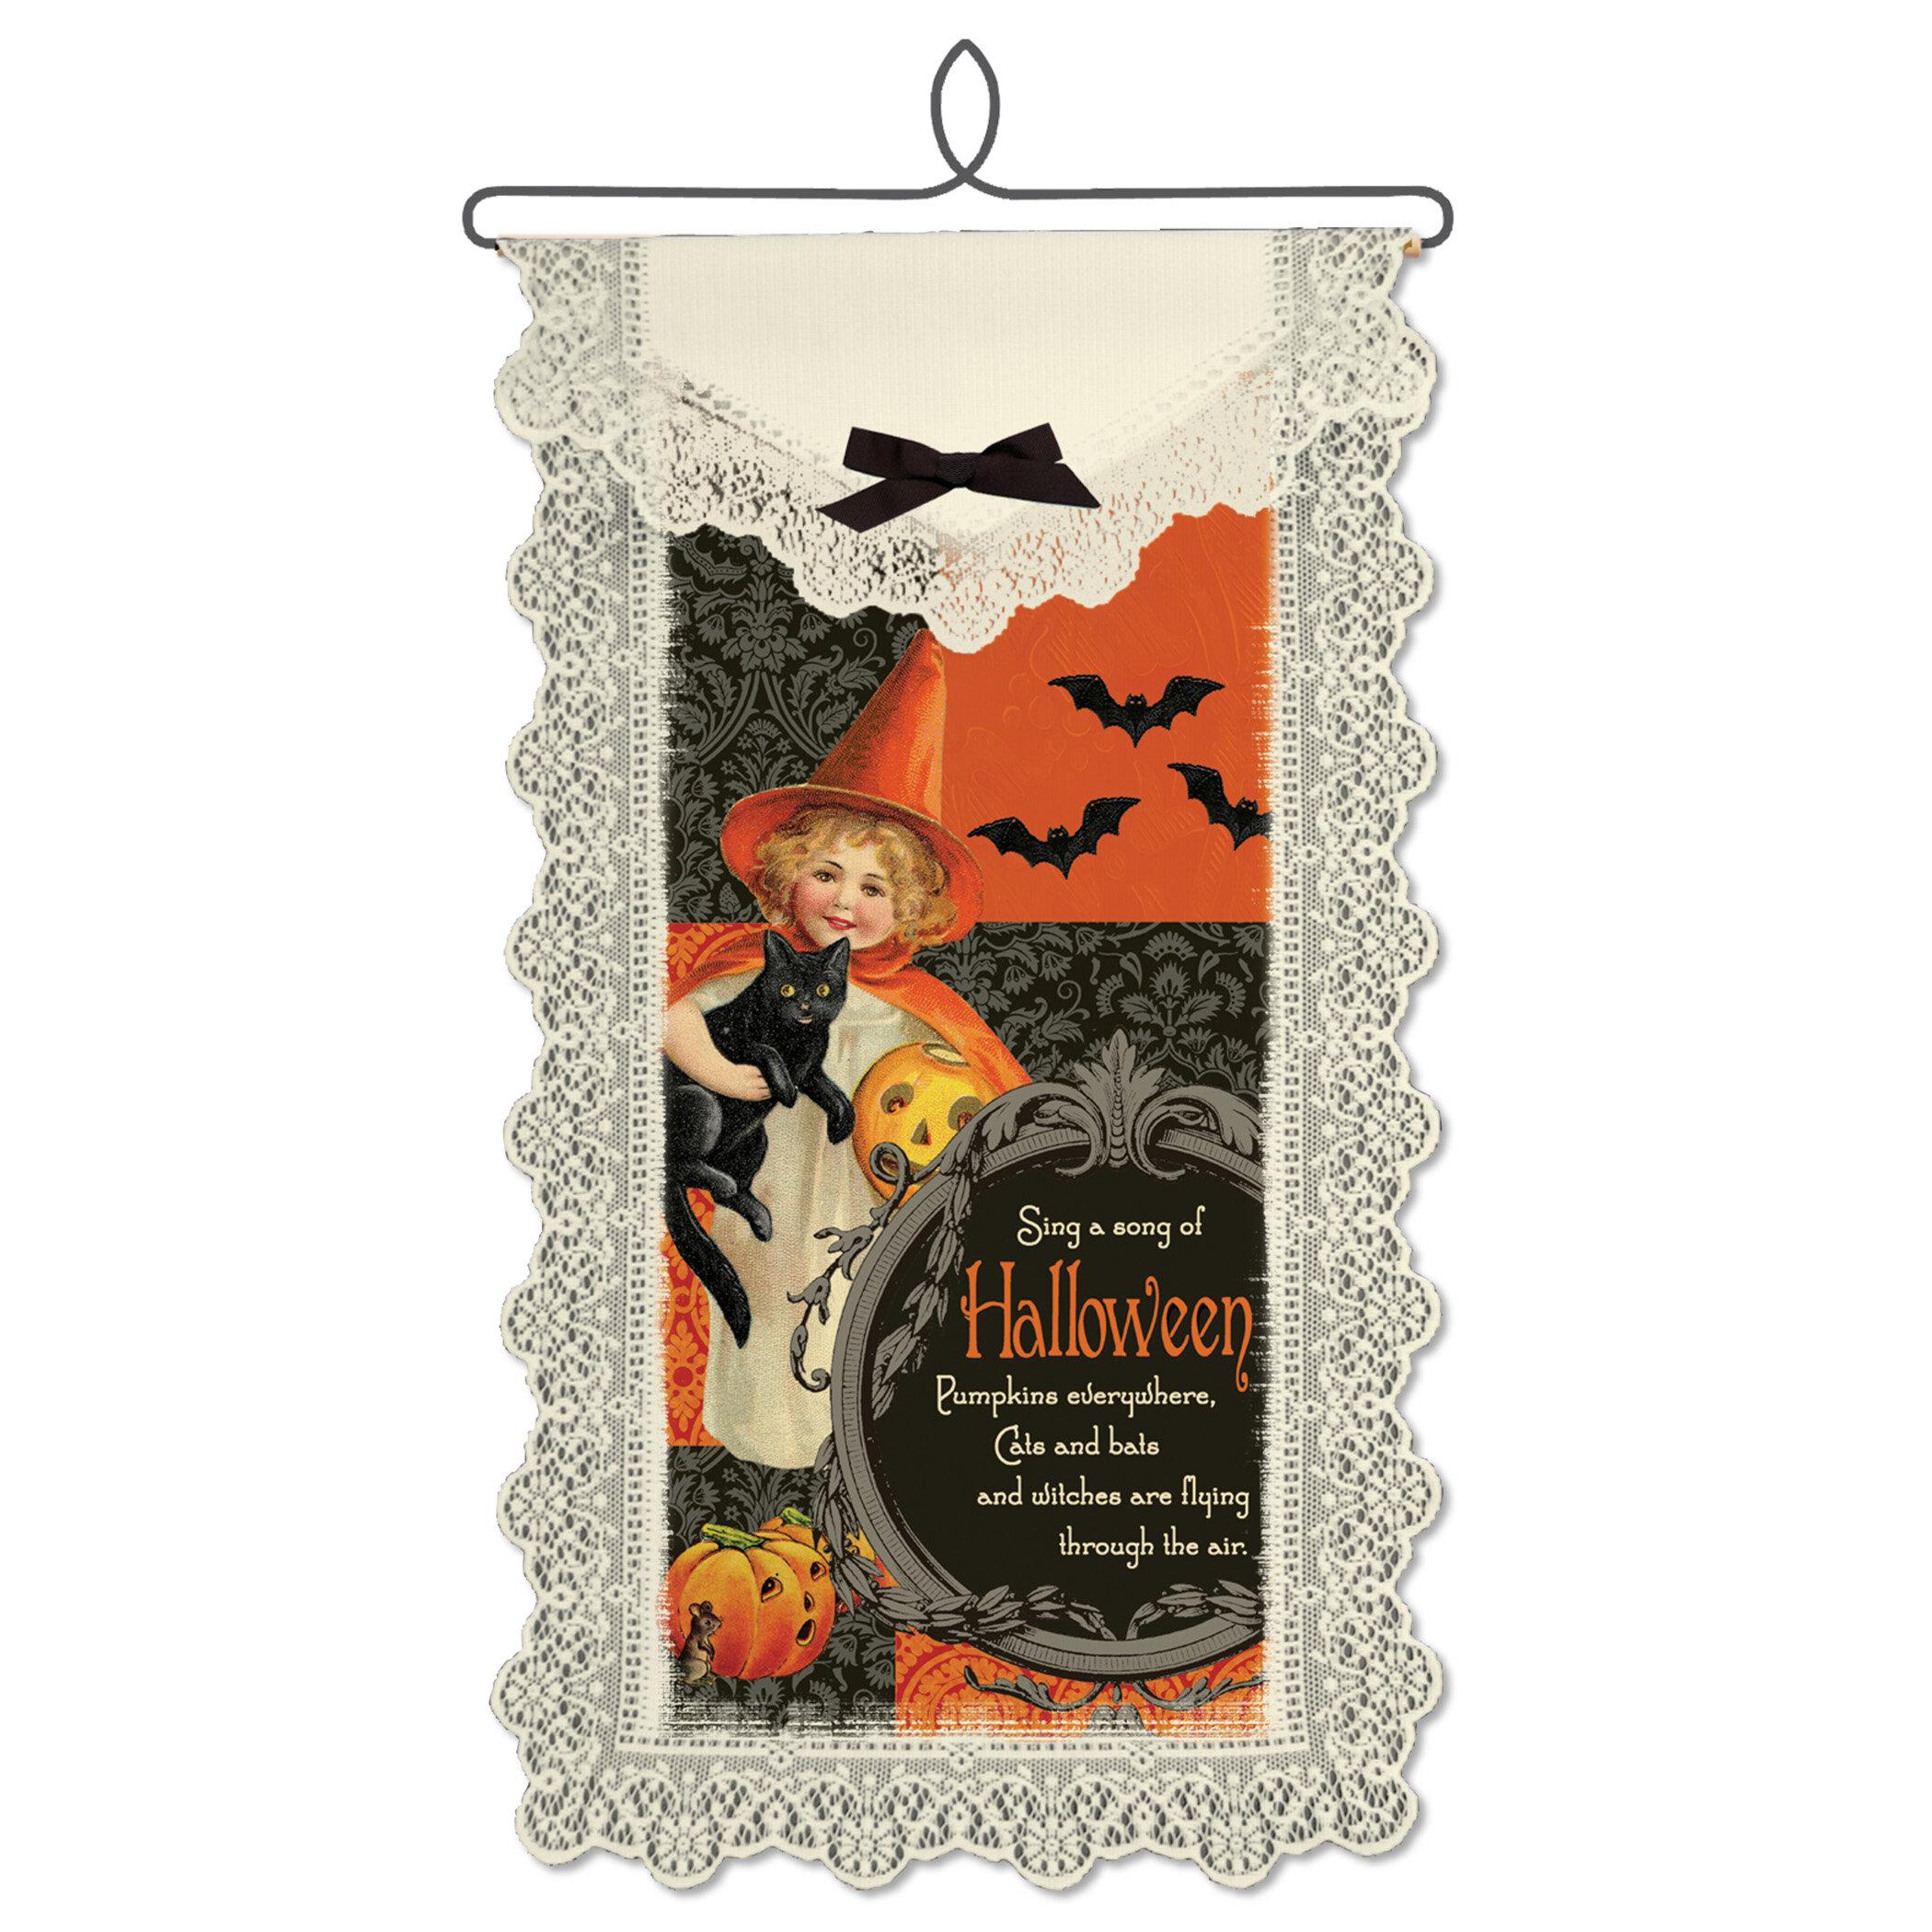 The Holiday Aisle Song Of Halloween Wall Hanging Wayfair